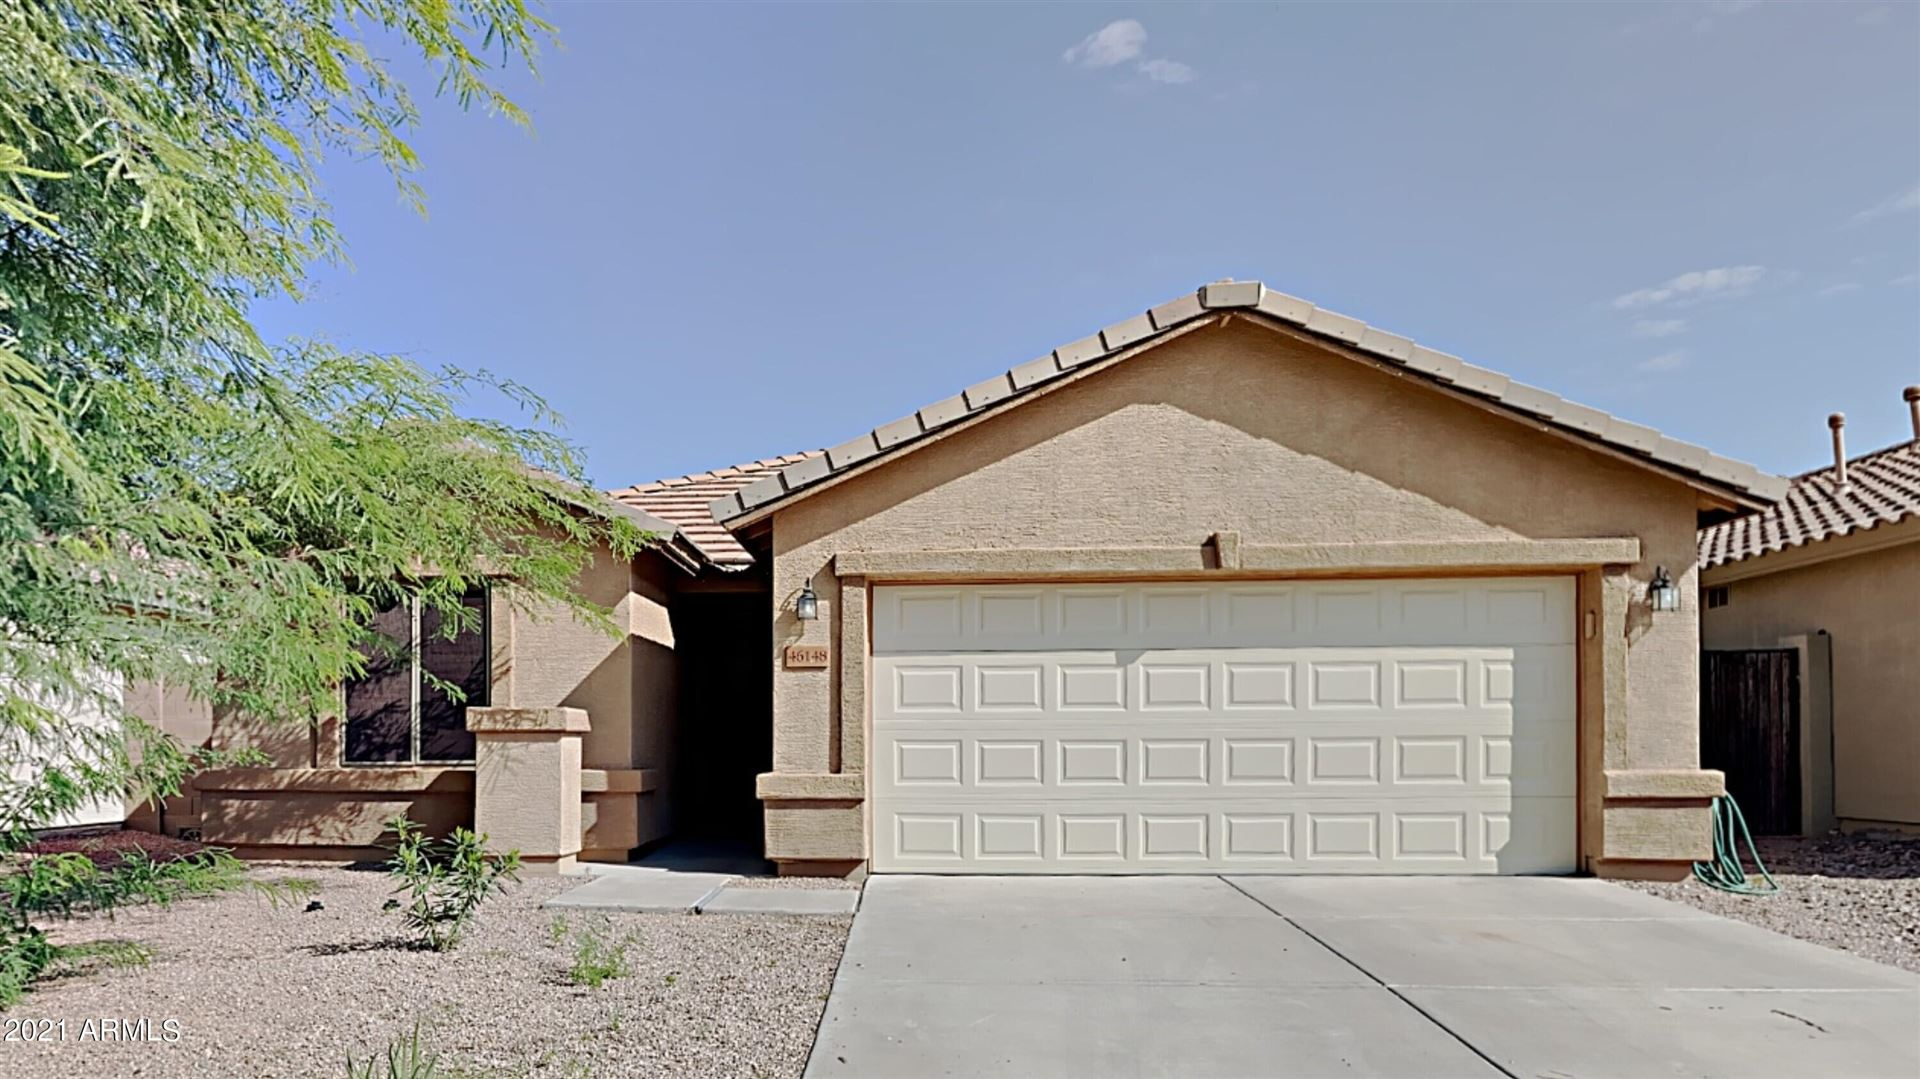 Photo of 46148 W STARLIGHT Drive, Maricopa, AZ 85139 (MLS # 6295470)